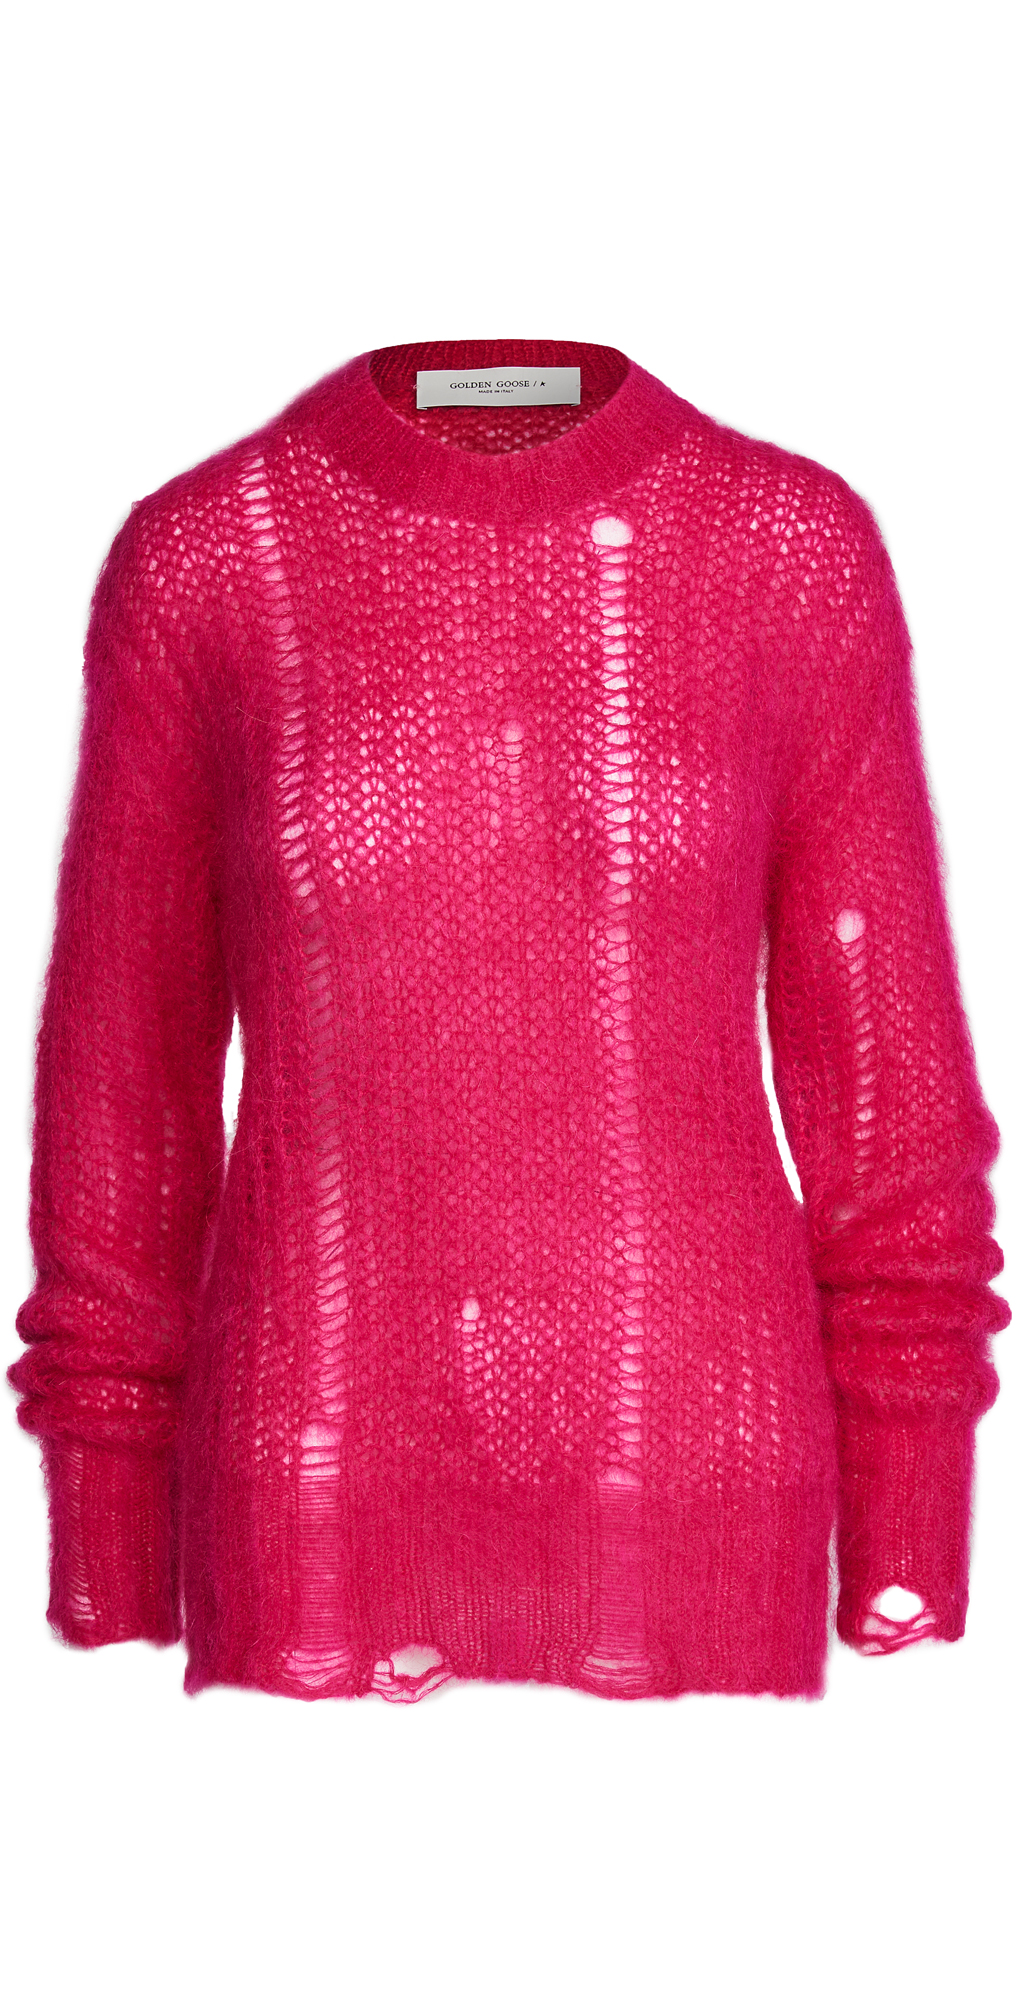 Golden Goose Round Neck Mohair Sweater